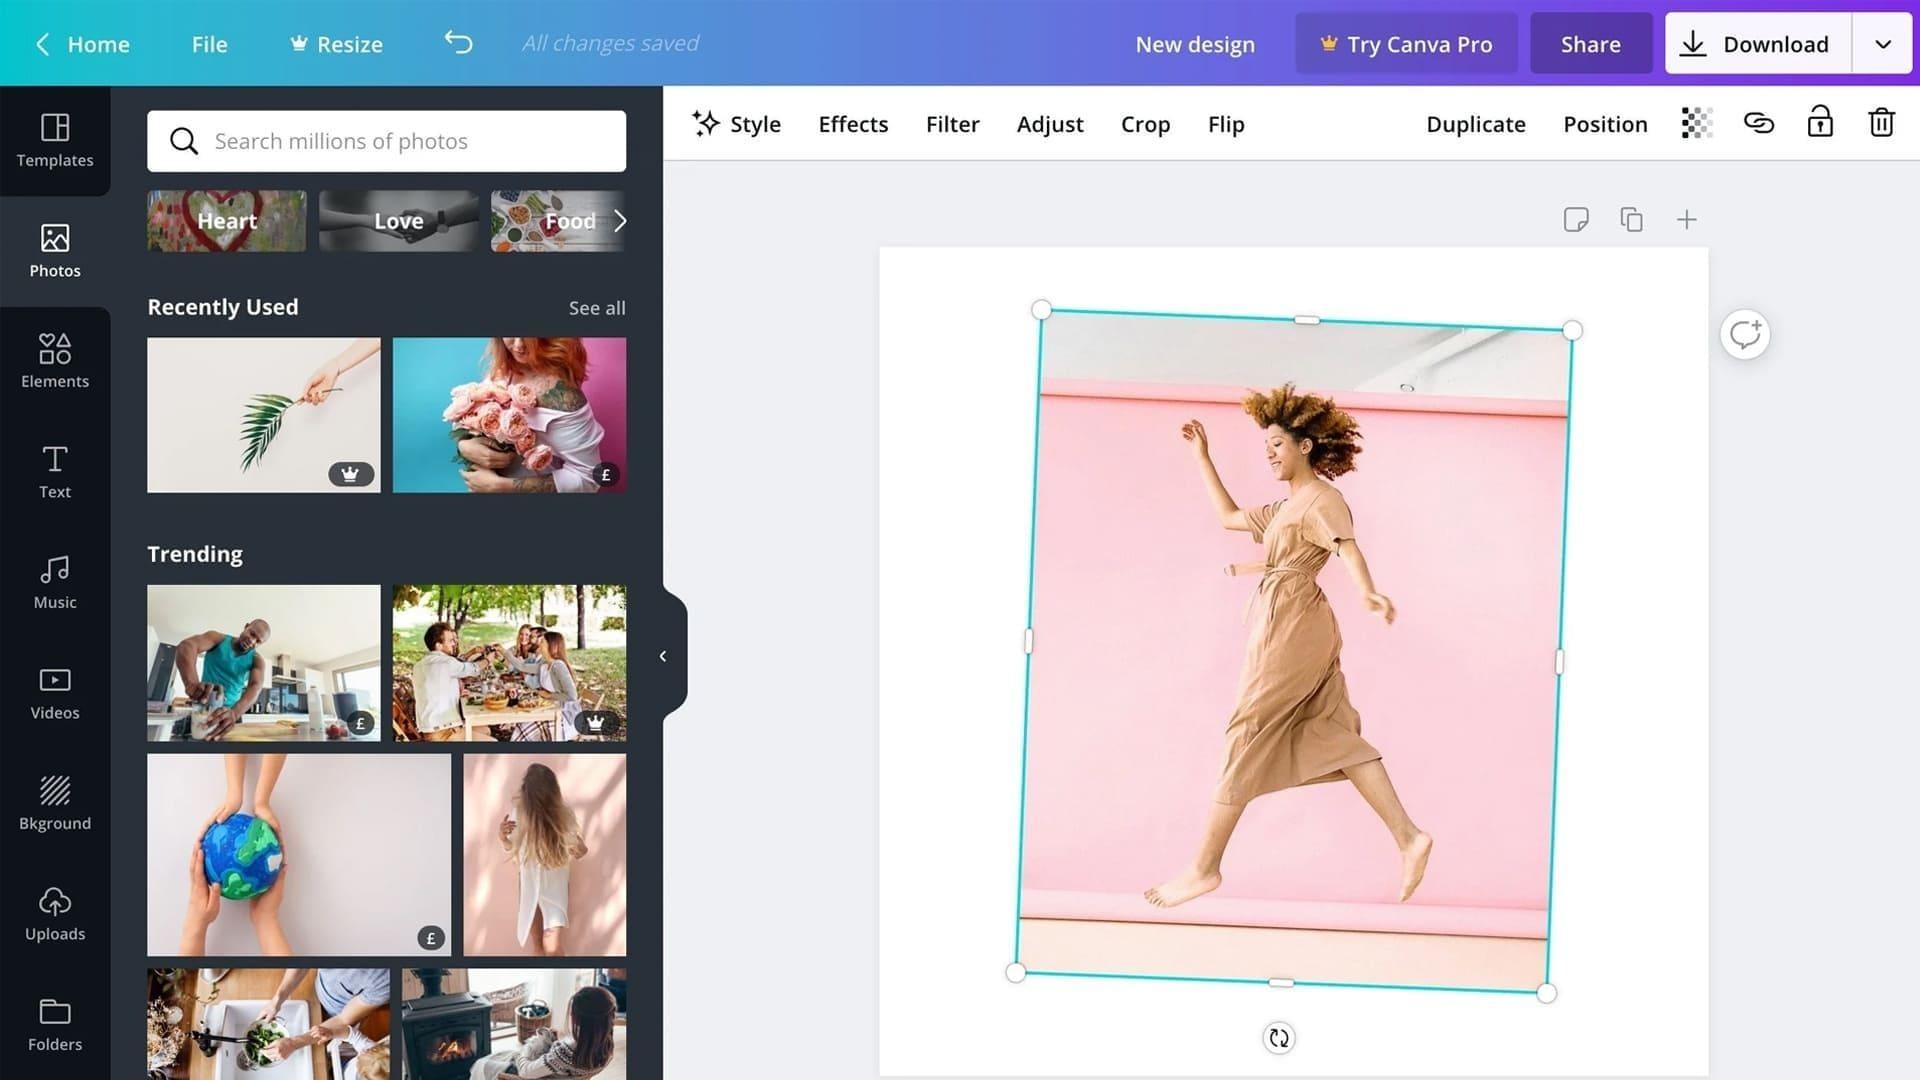 Captura de tela que mostra o editor de fotos Canva